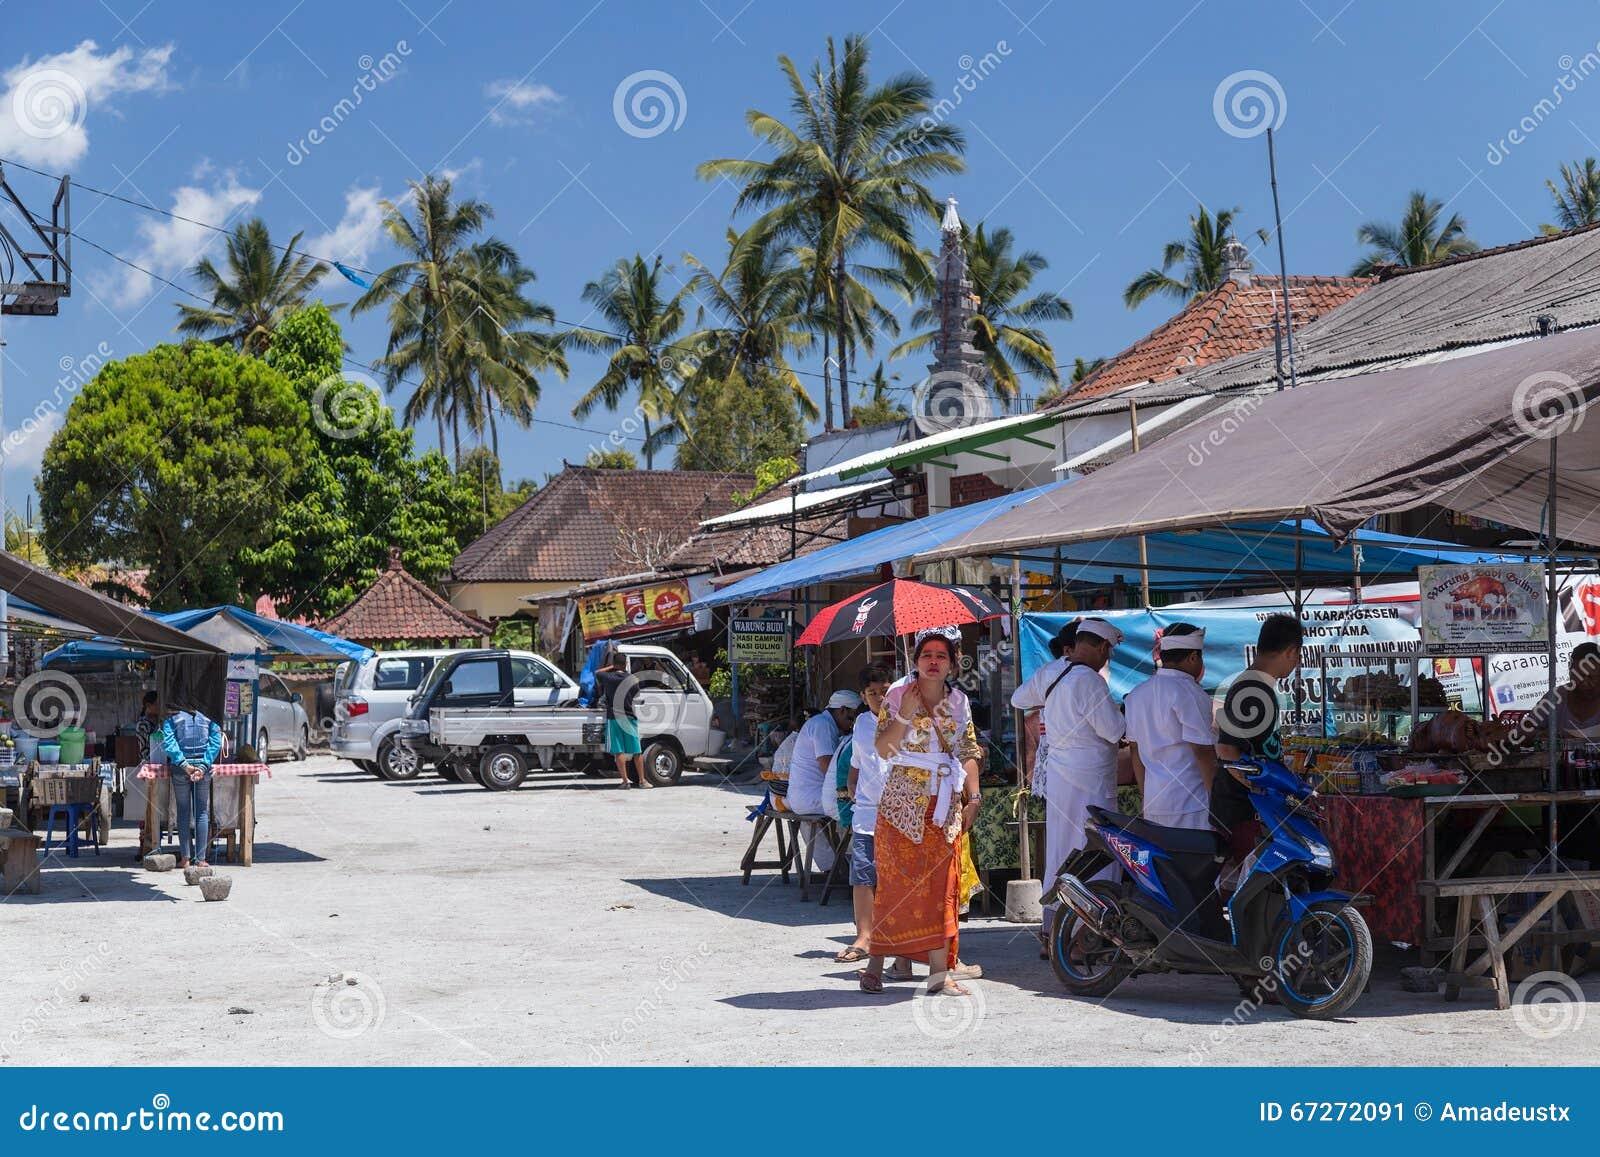 Village of Besakih, Bali/Indonesia - circa October 2015: Roadside restaurant at village market in Bali, Indonesia